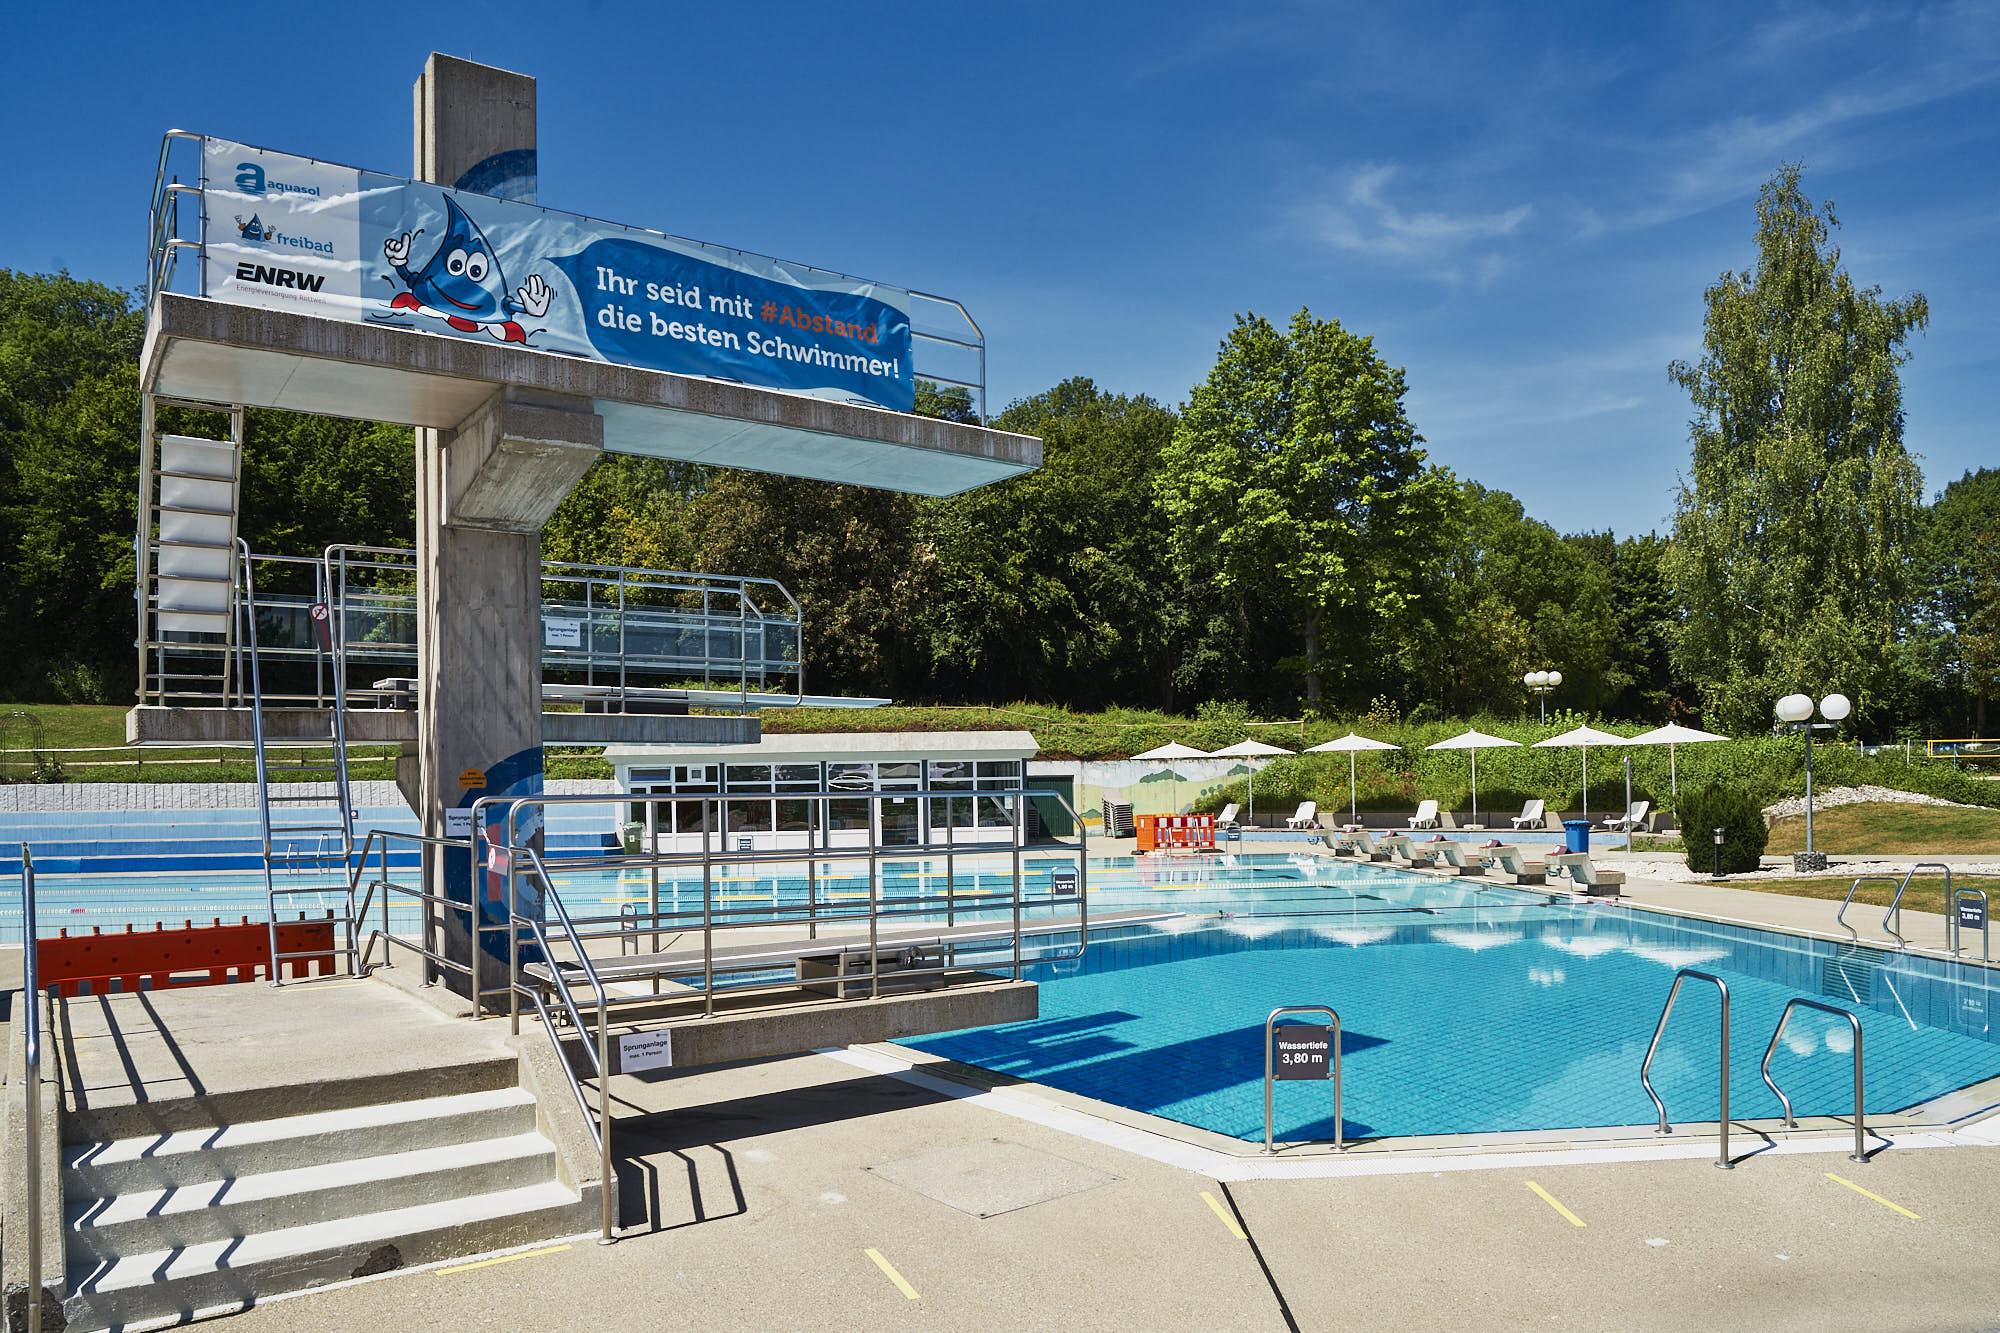 Das Rottweiler Freibad öffnet am 8. Juni 2021. Foto: pm